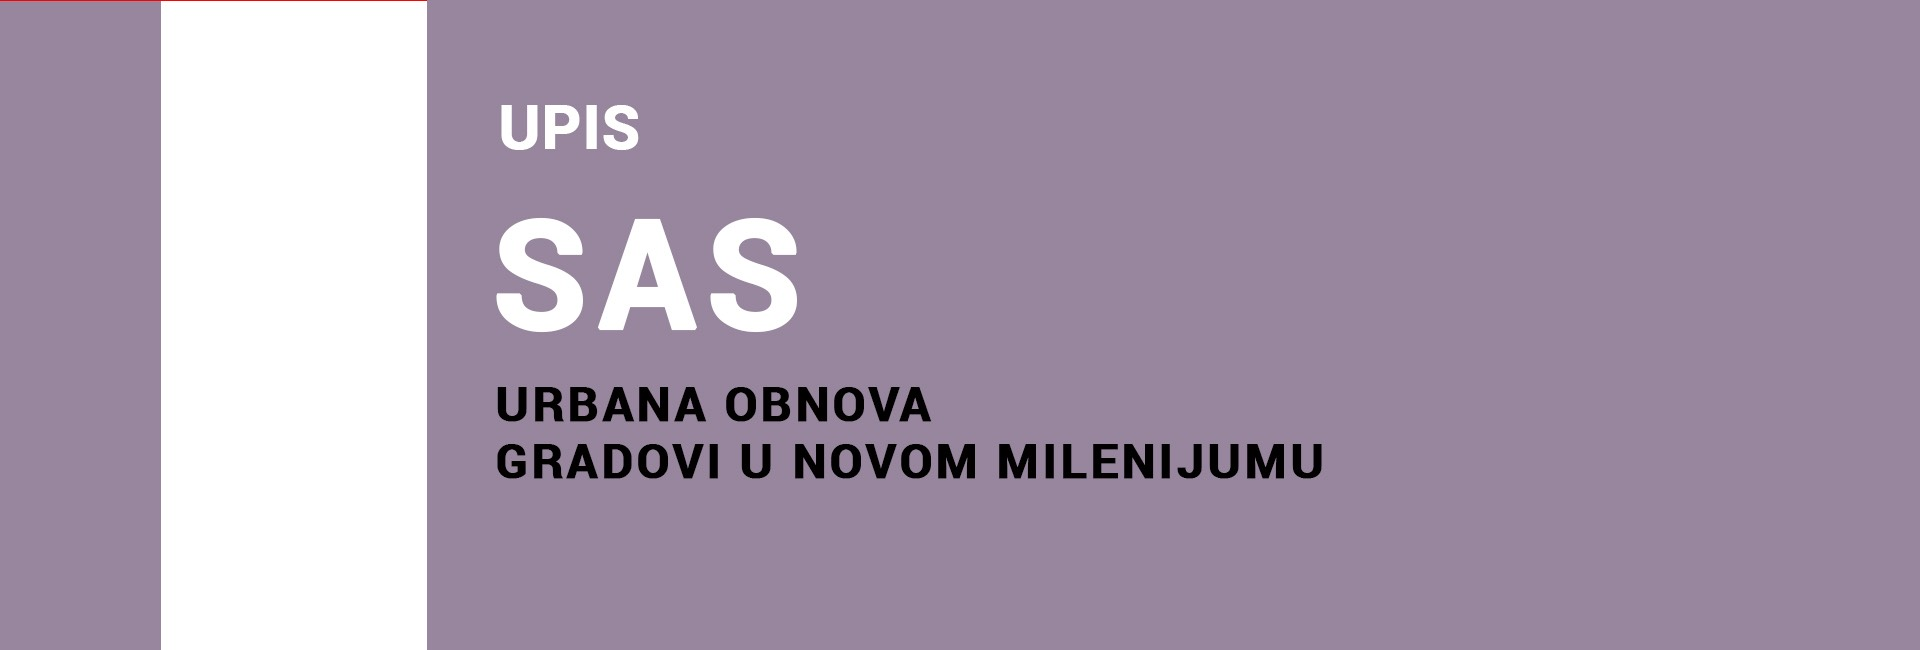 sas URBANA OBNOVA upis-2